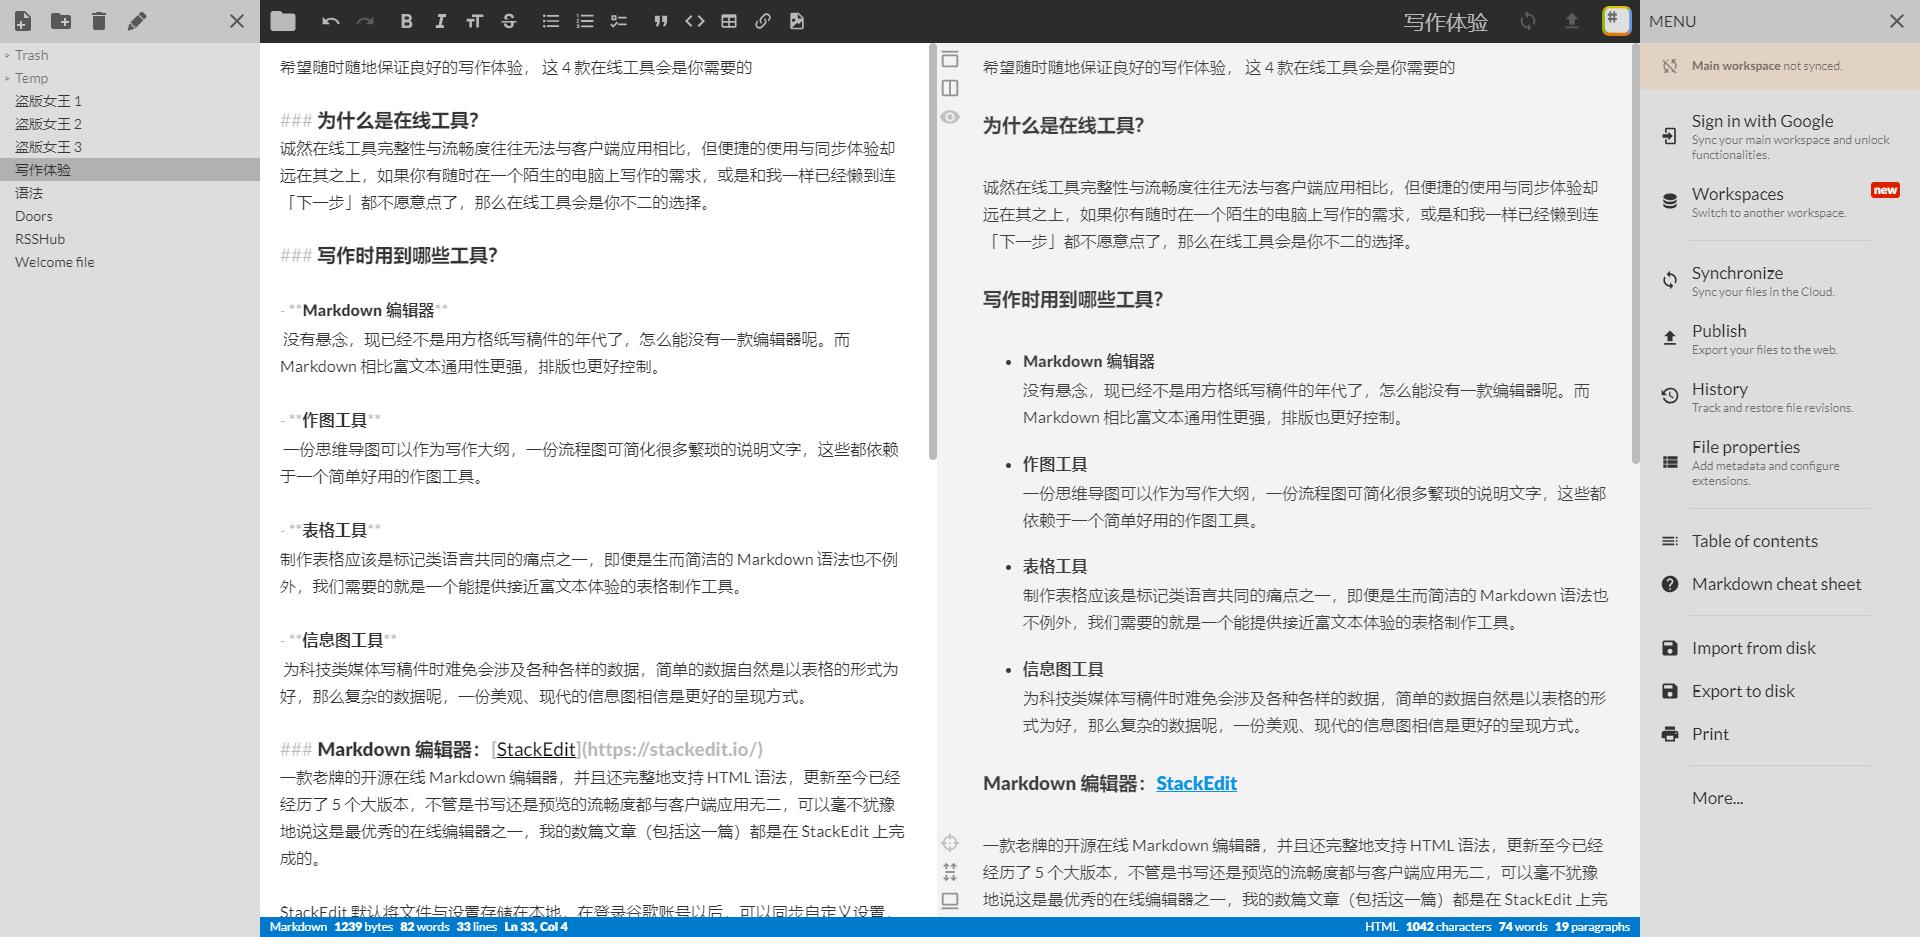 StackEdit 的主界面,左右分别是文档与设置界面,都可关闭,中间的编辑界面可在阅读、纯编辑与实时预览三个状态中切换